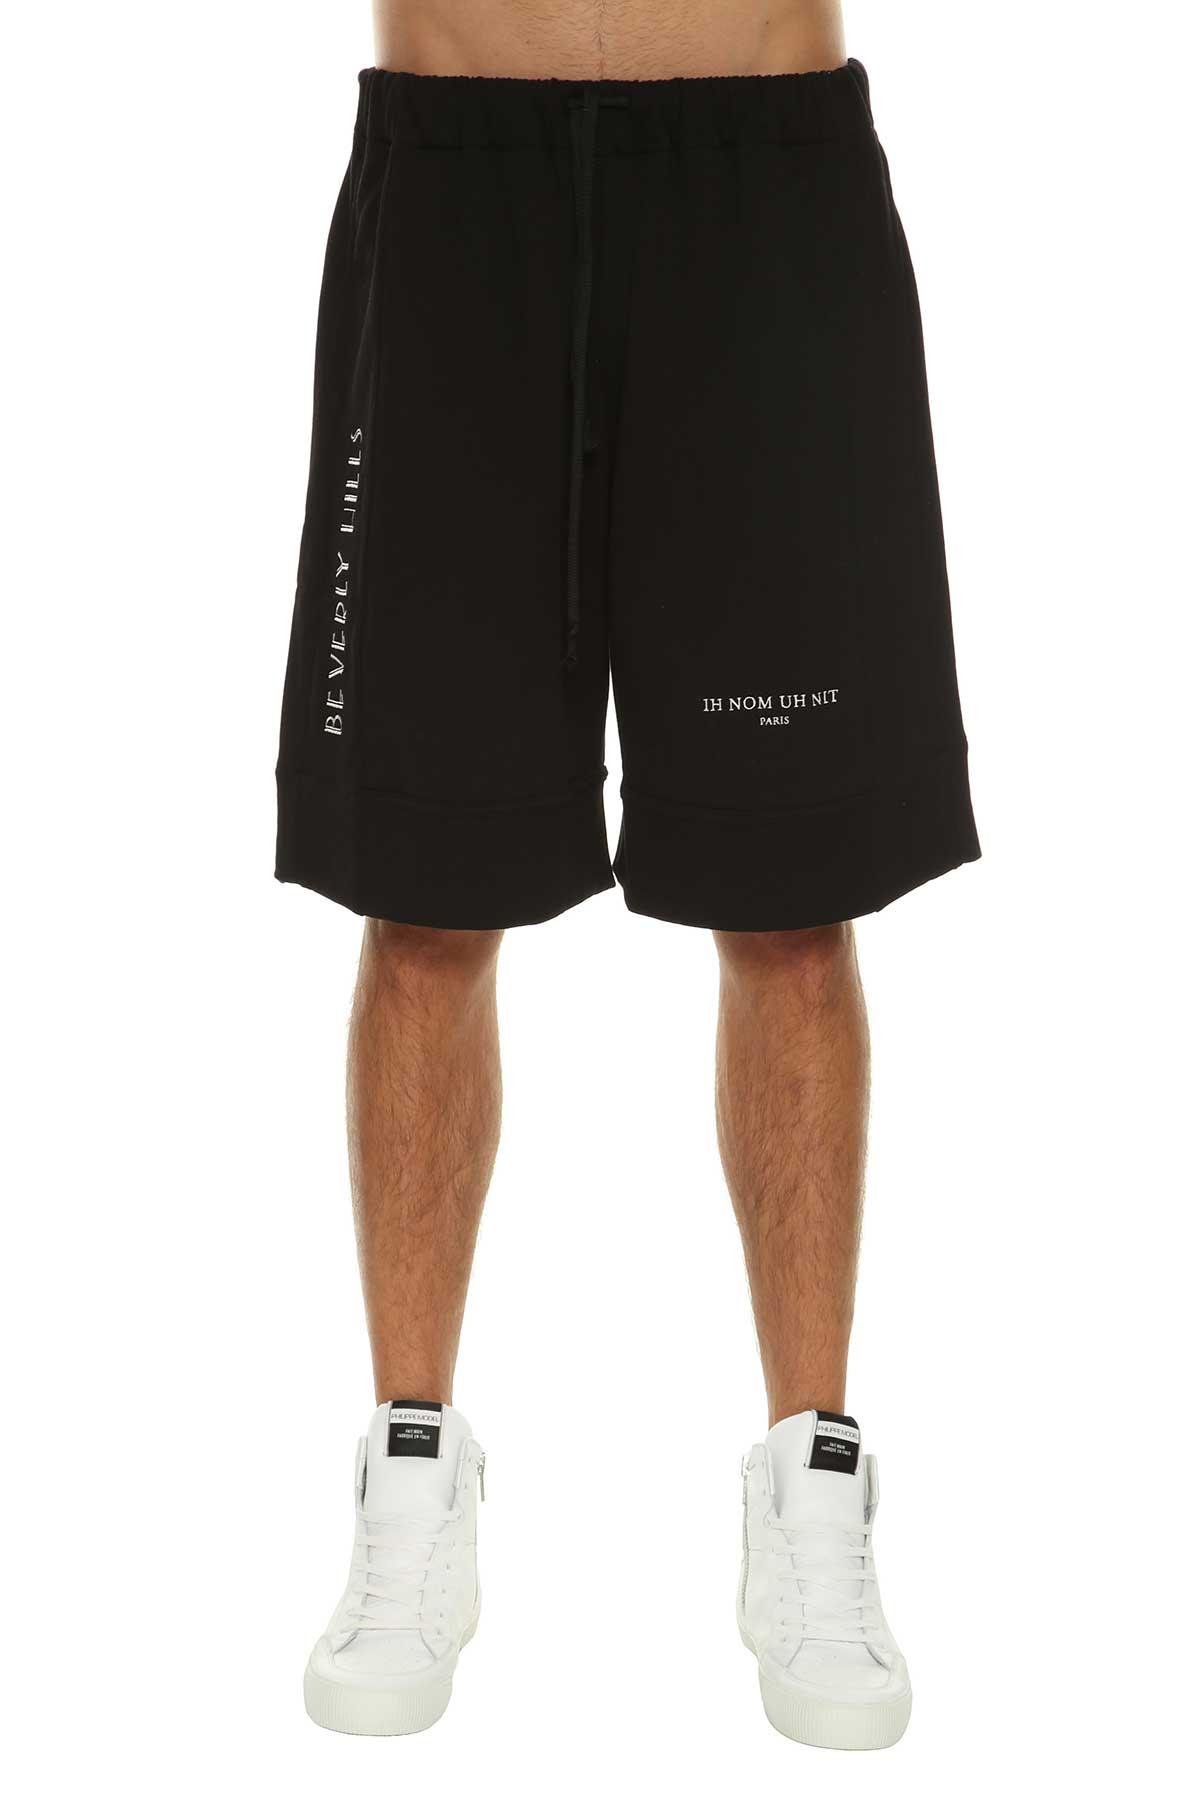 Ih Nom Uh Nit Ih Nom Uh Nit Baggy Shorts